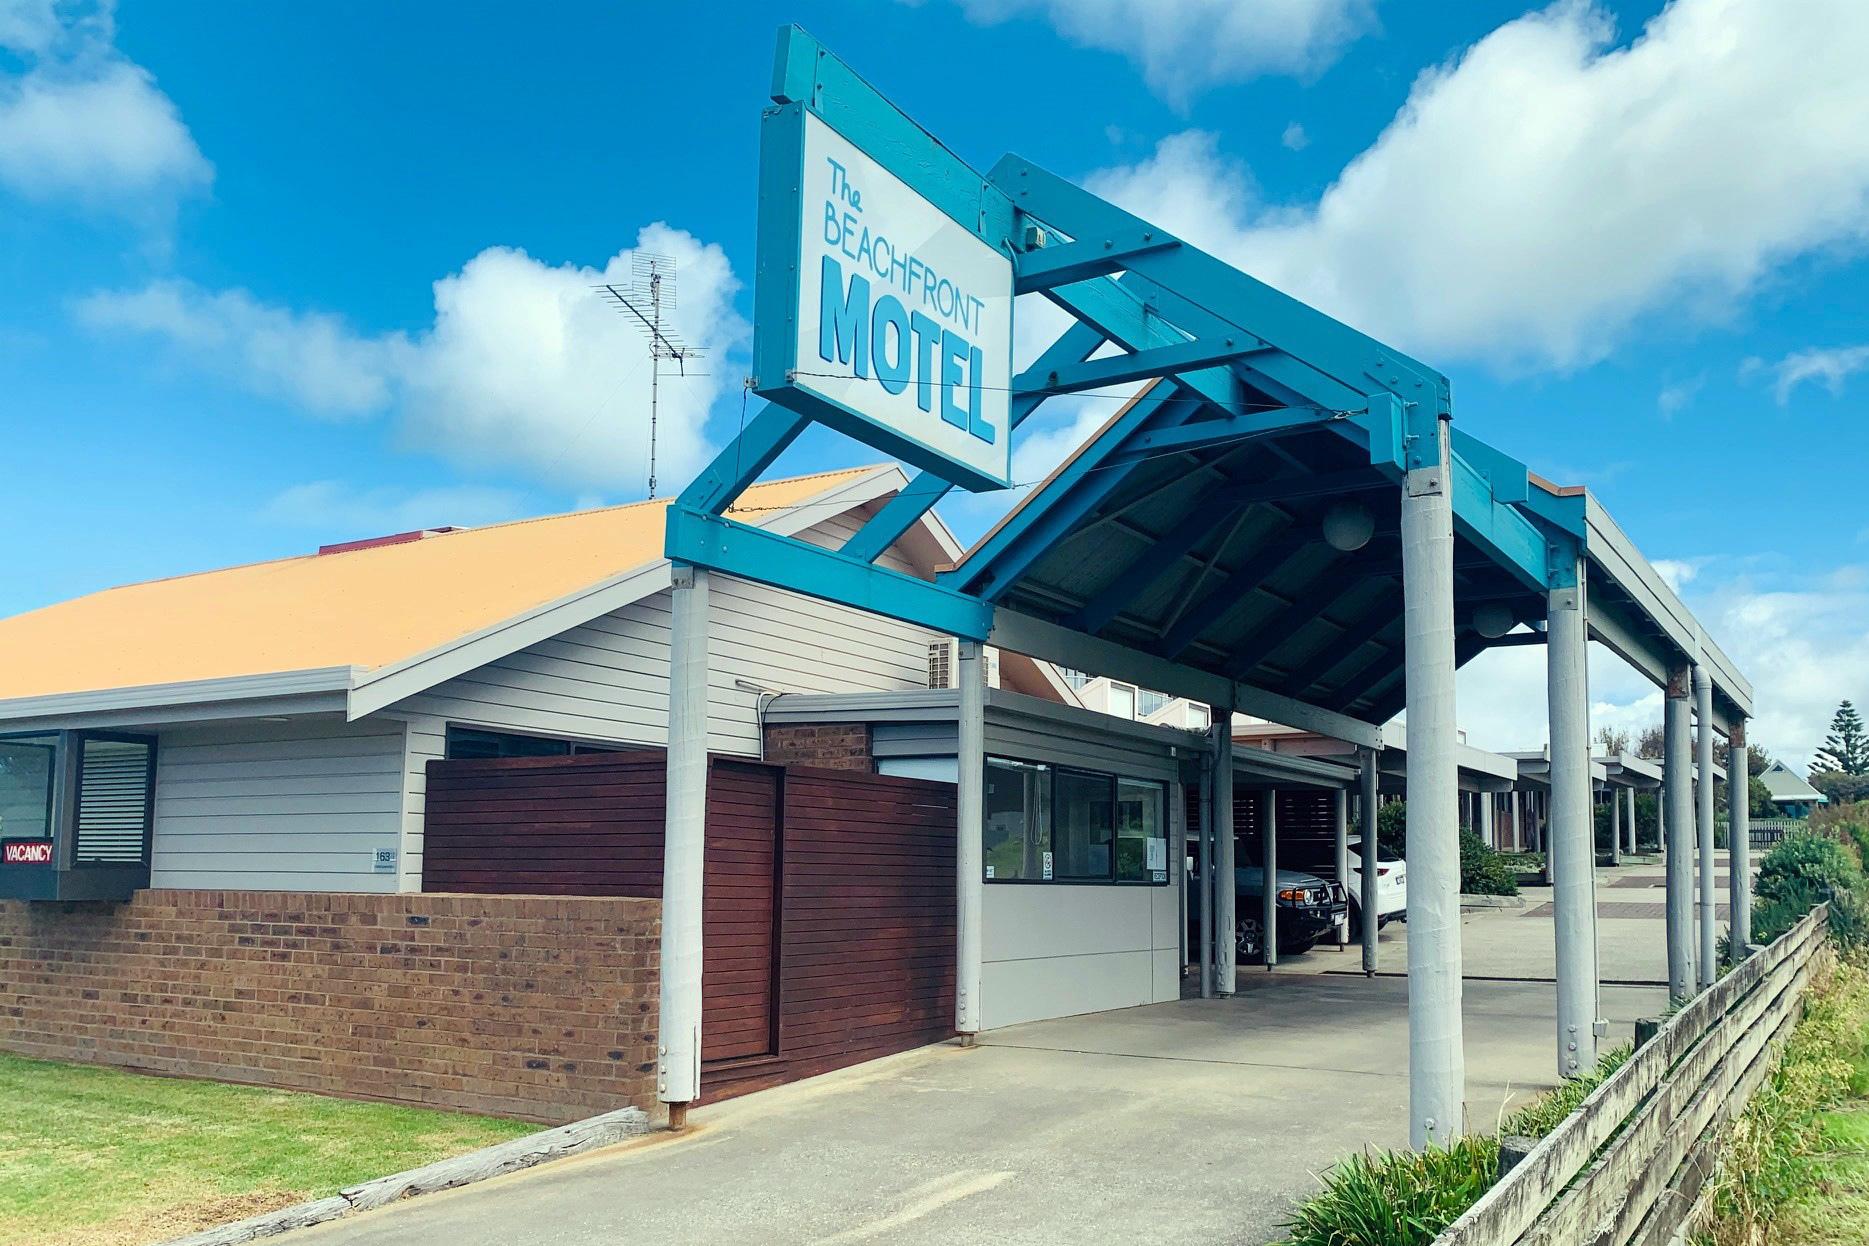 d - The Beachfront Motel